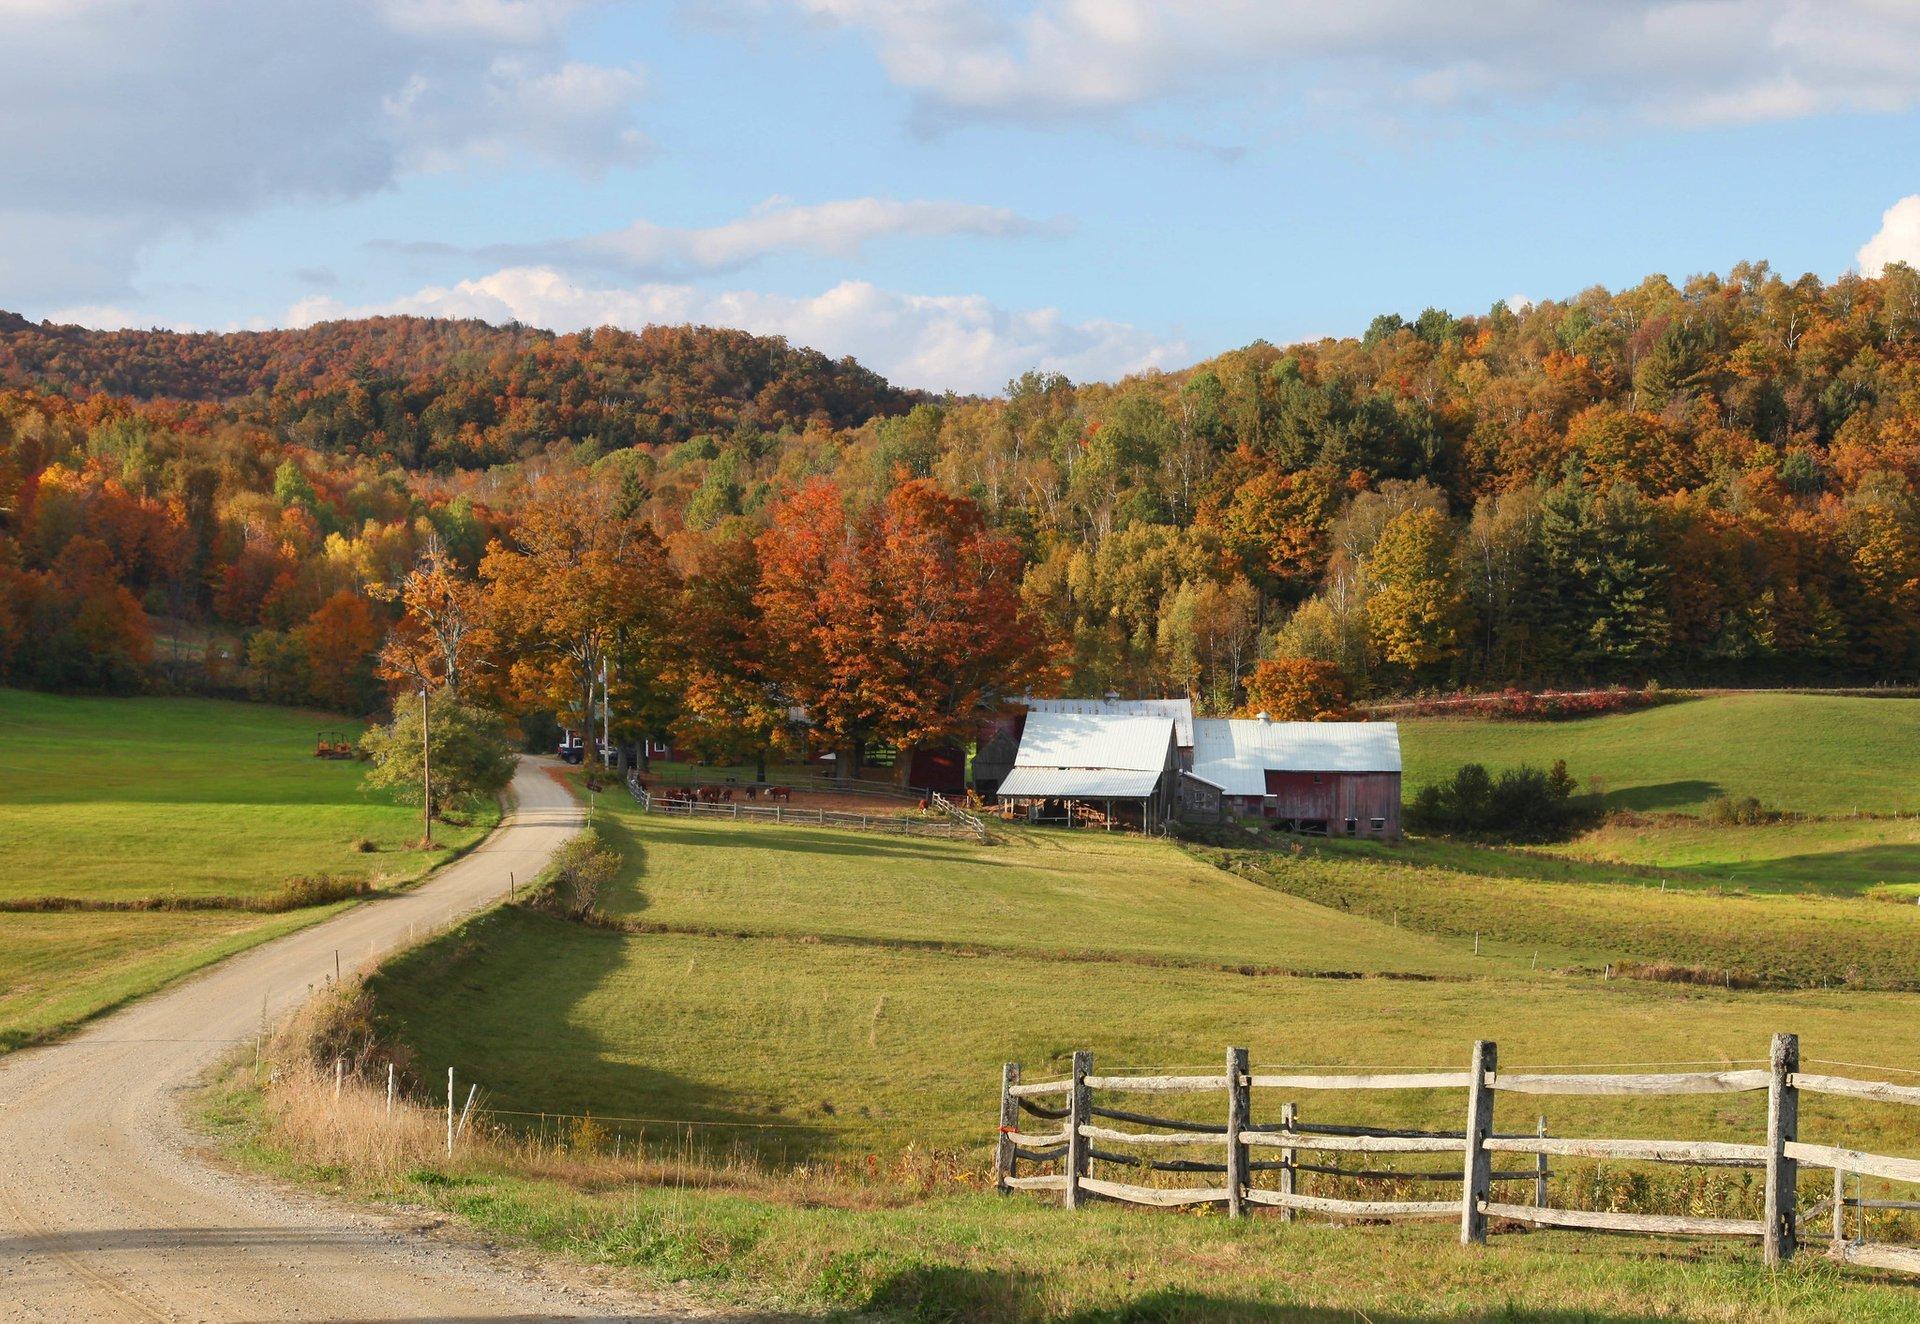 Jenne Farm in Reading, Vermont 2020